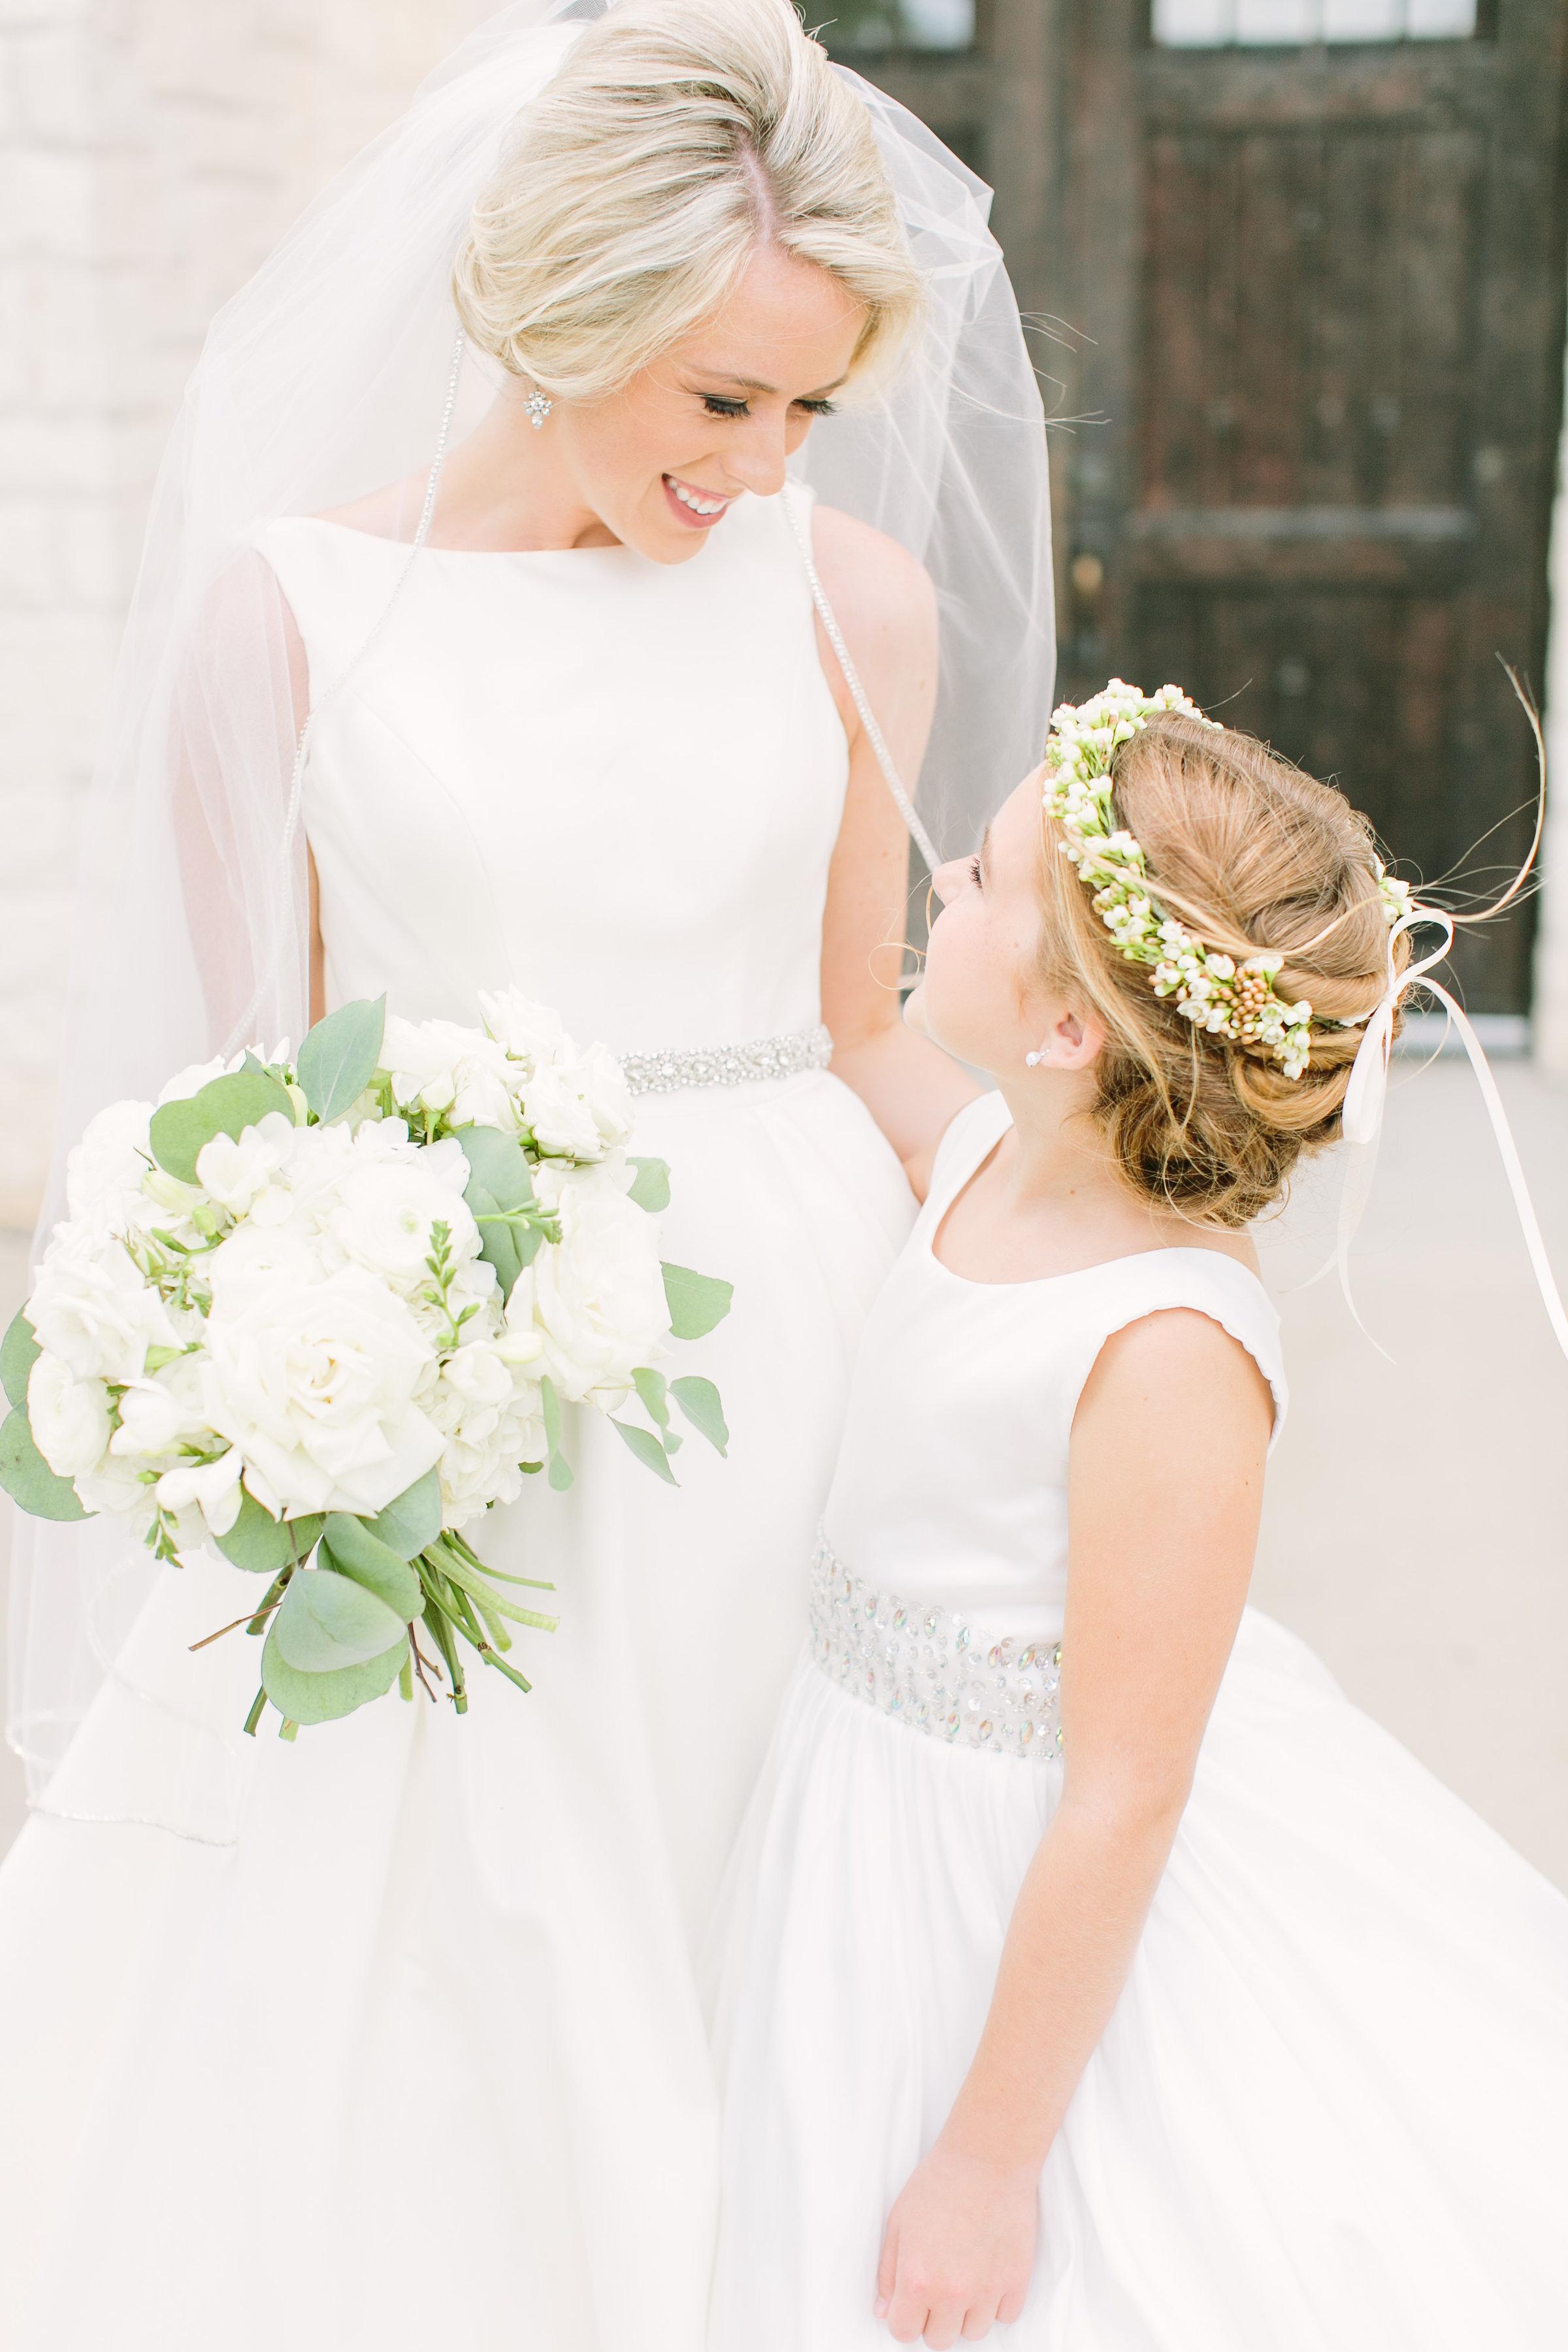 bride-flower-girl-white-greenery-bouquet-flower-crown-by-maxit-flower-design-in-houston-texas